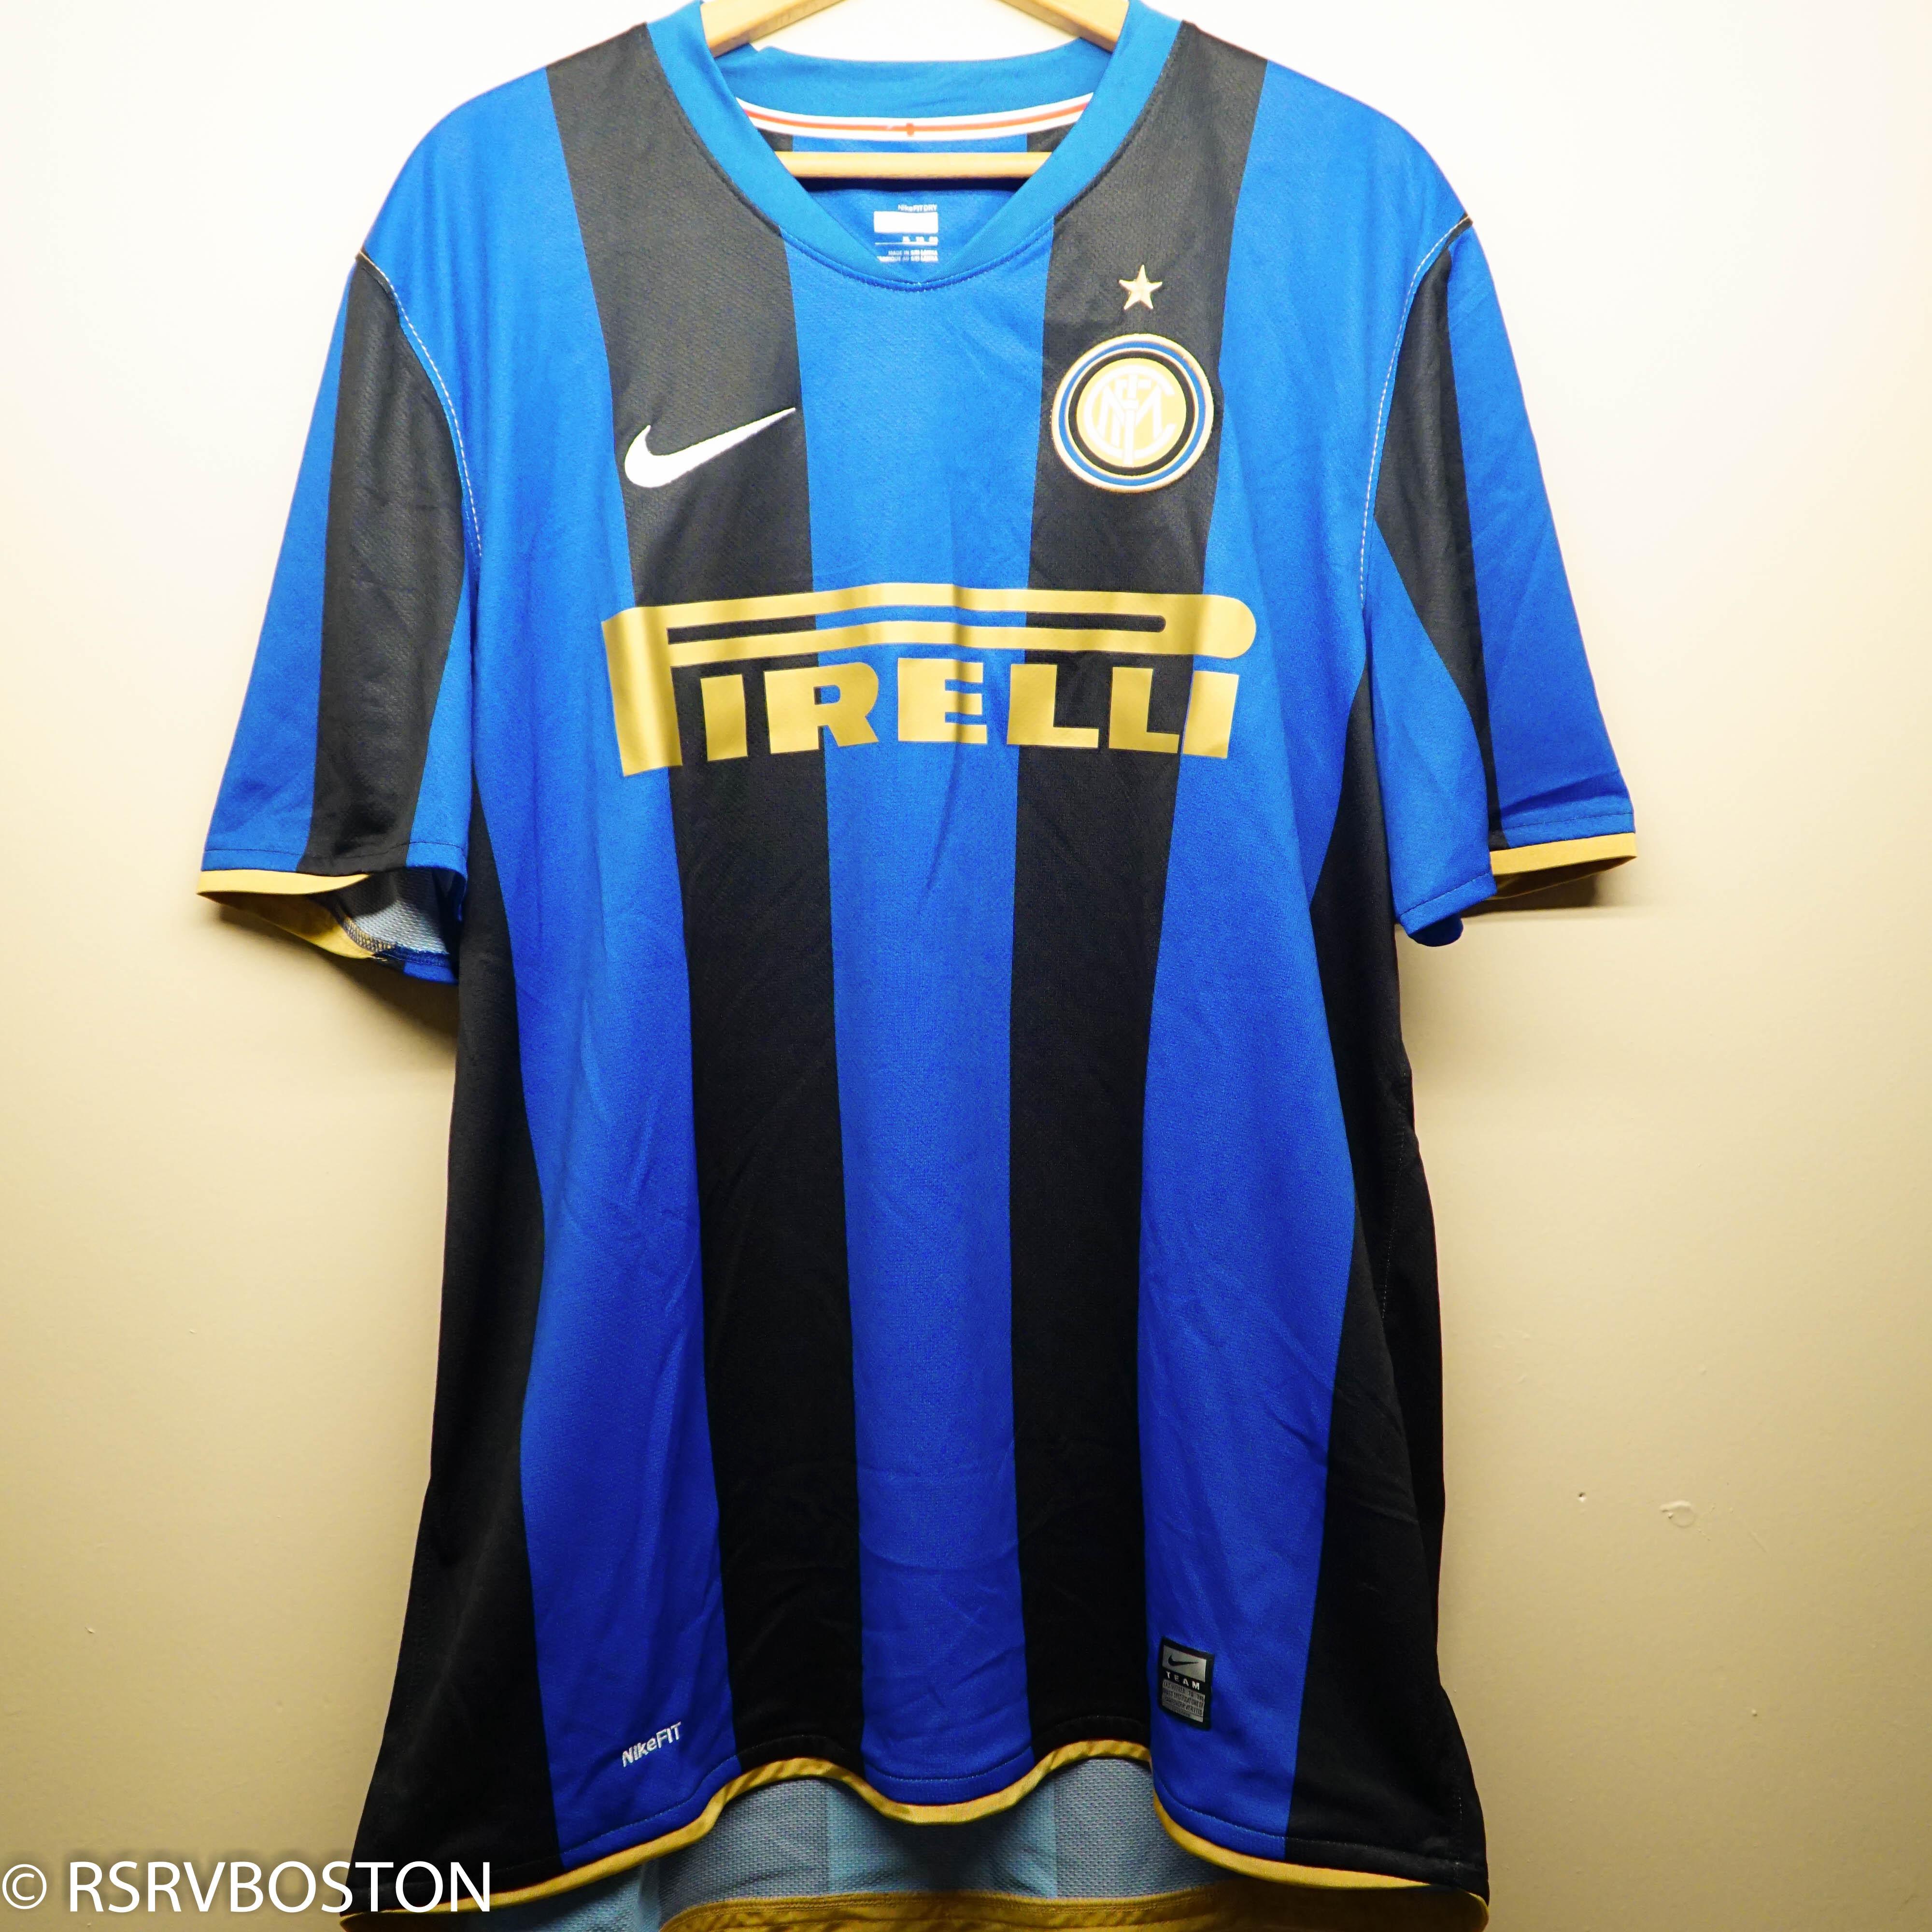 finest selection 076c0 f27a8 Inter Milan 2008-2009 Home Jersey Blue Black Stripes Soccer Pirelli